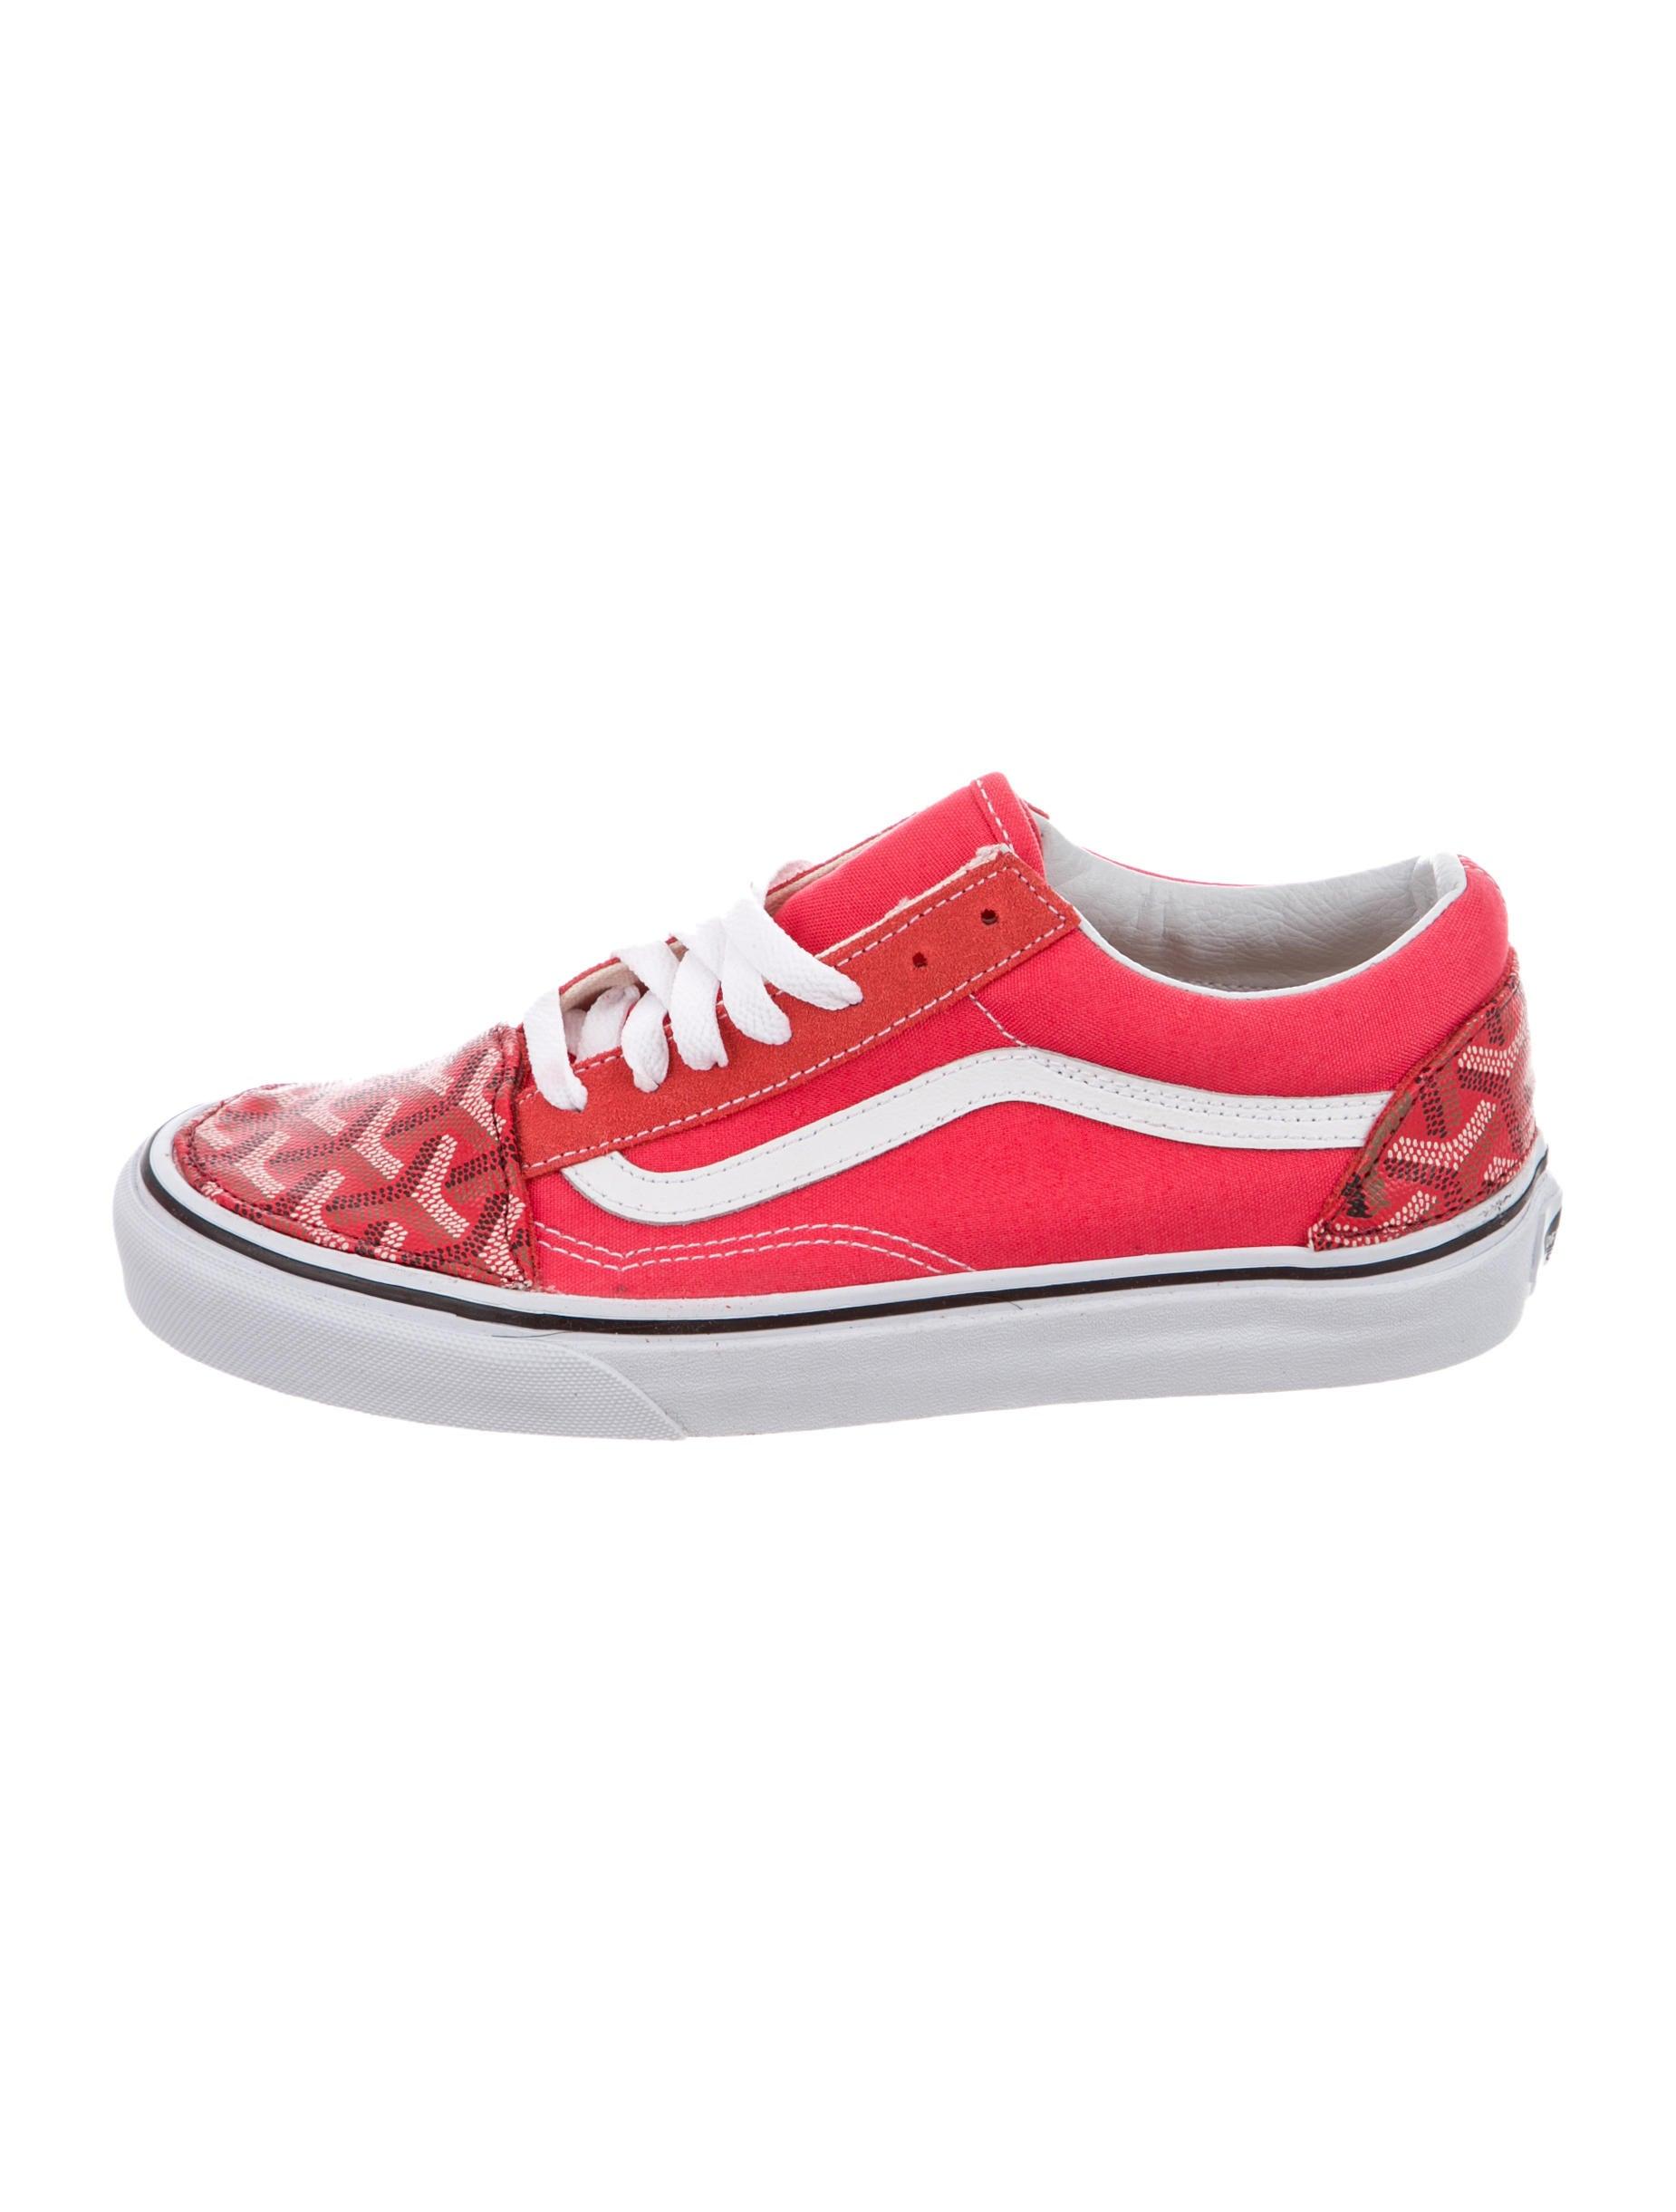 Goyard x Vans Round-Toe Sneakers w  Tags - Shoes - GOY20527  76553af6f